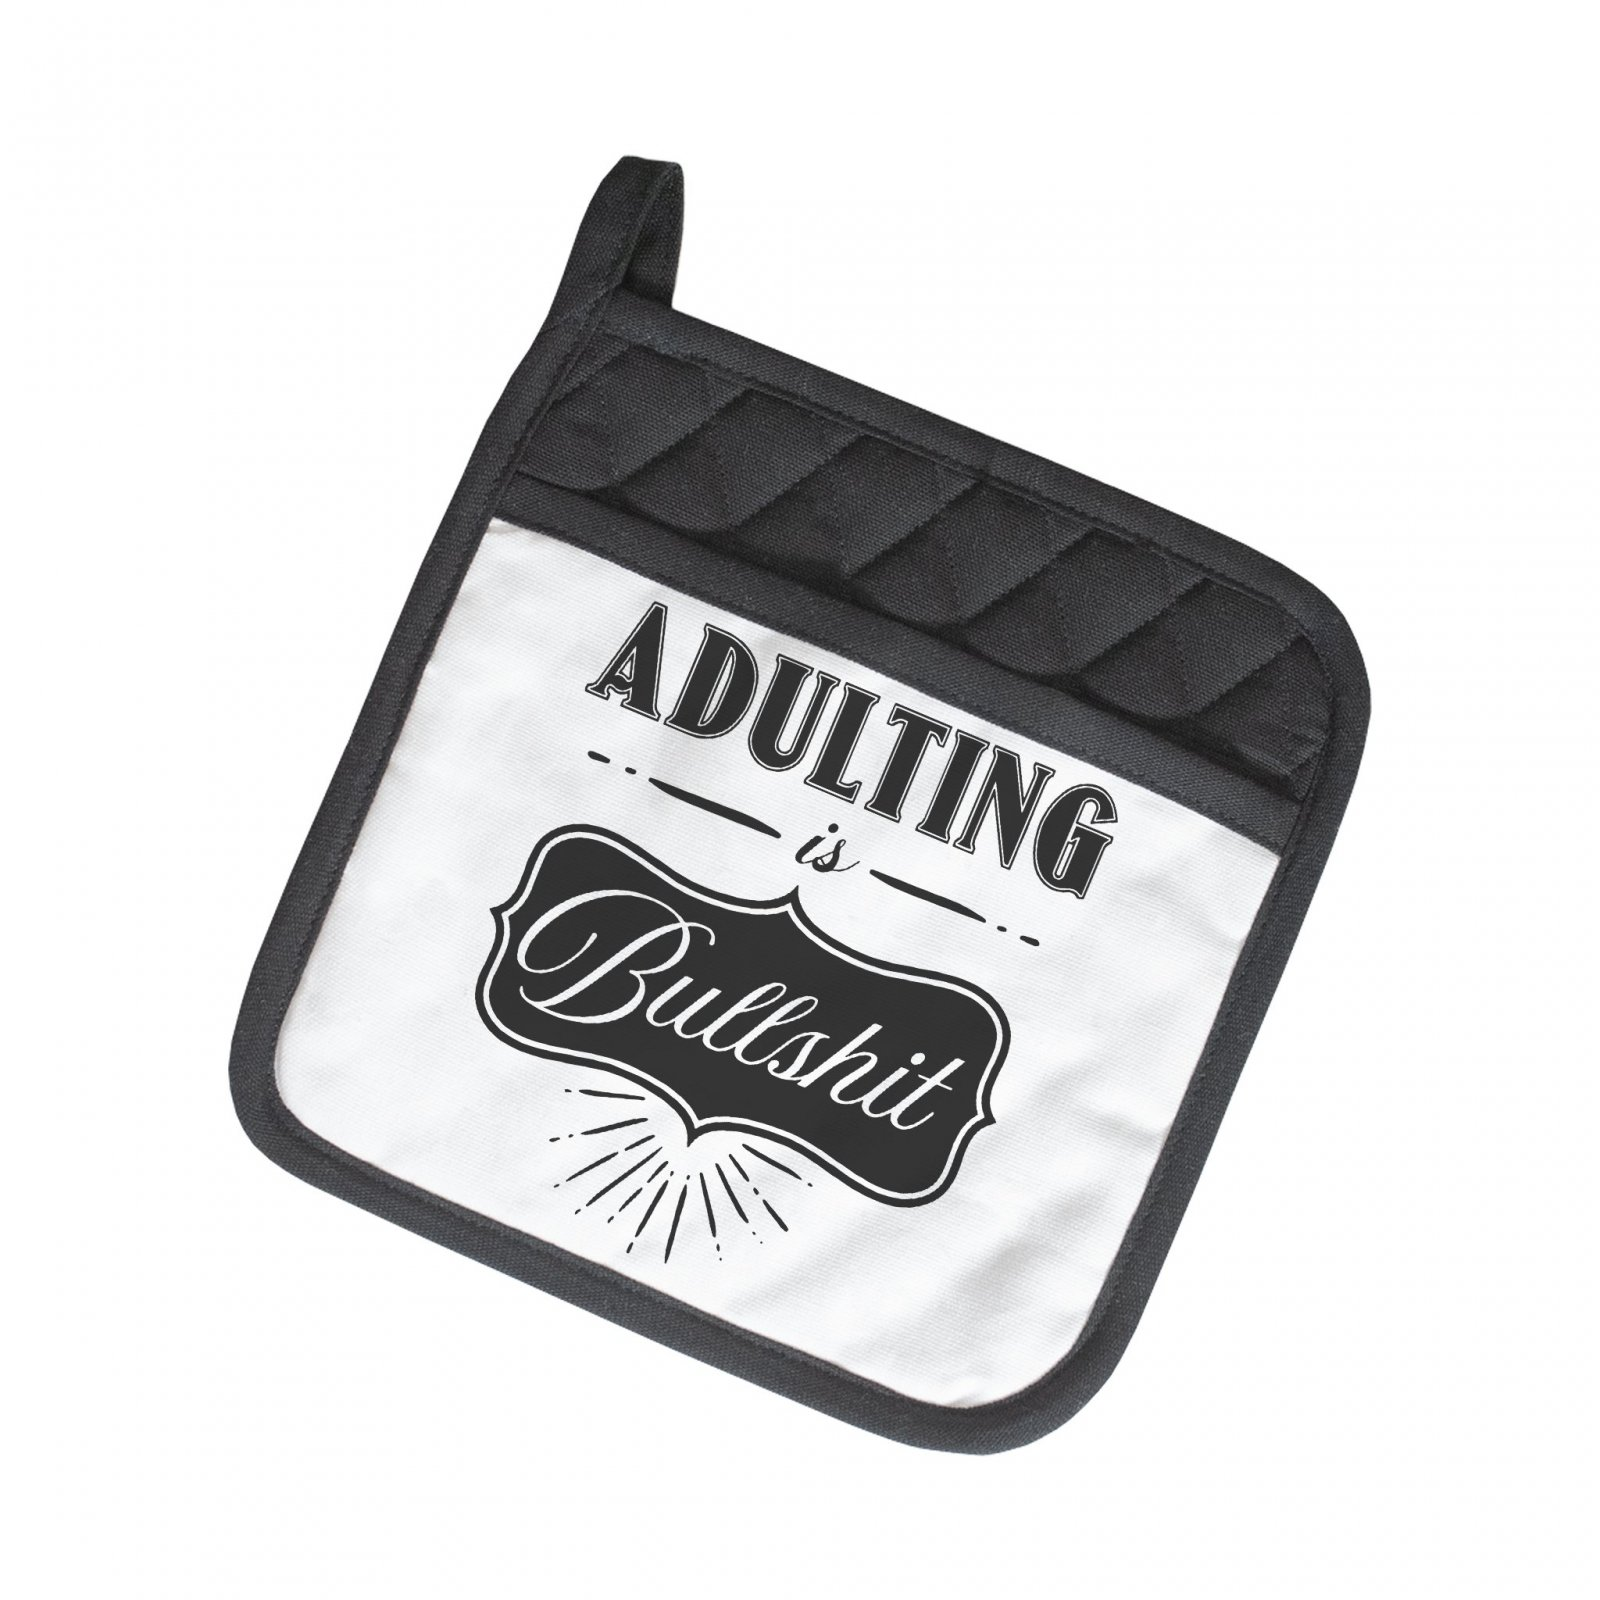 Pot Holder - Adulting